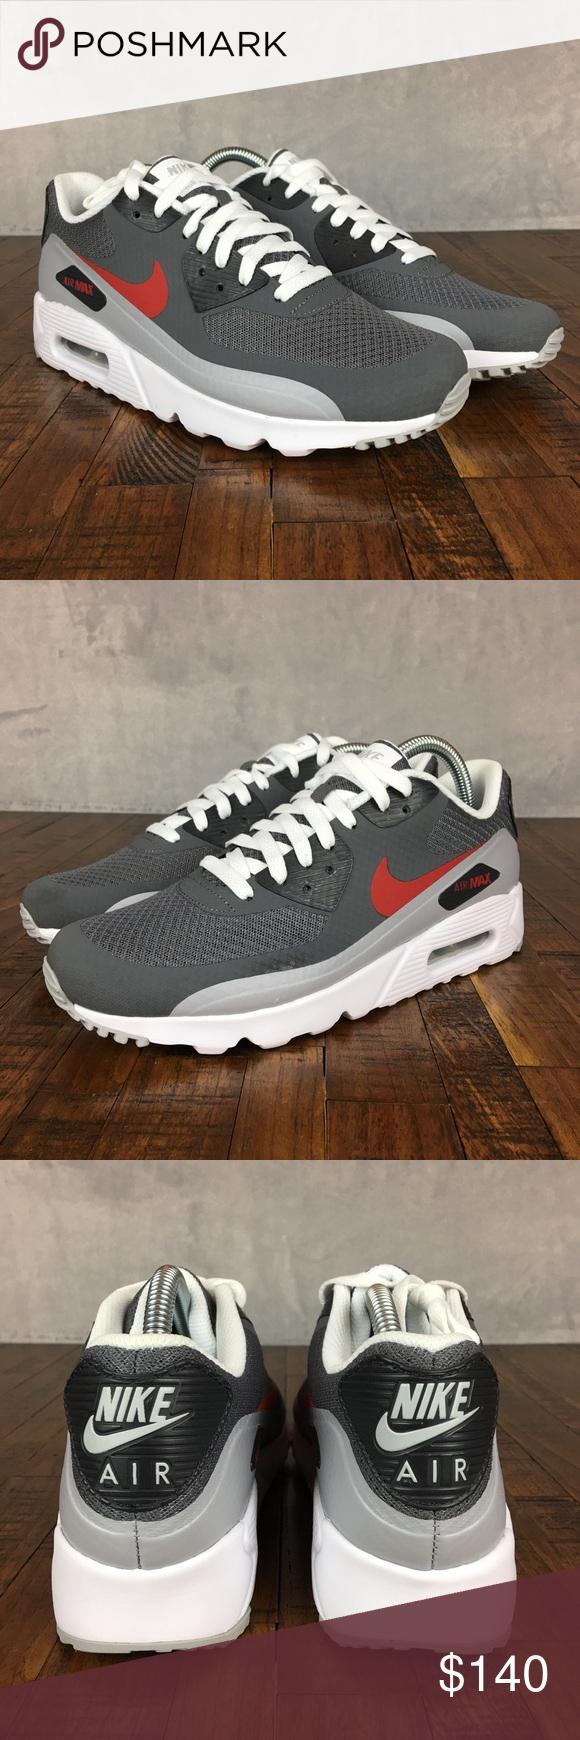 Nike Air Max 90 Ultra Essential Sneakers Womens 10 NIKE AIR